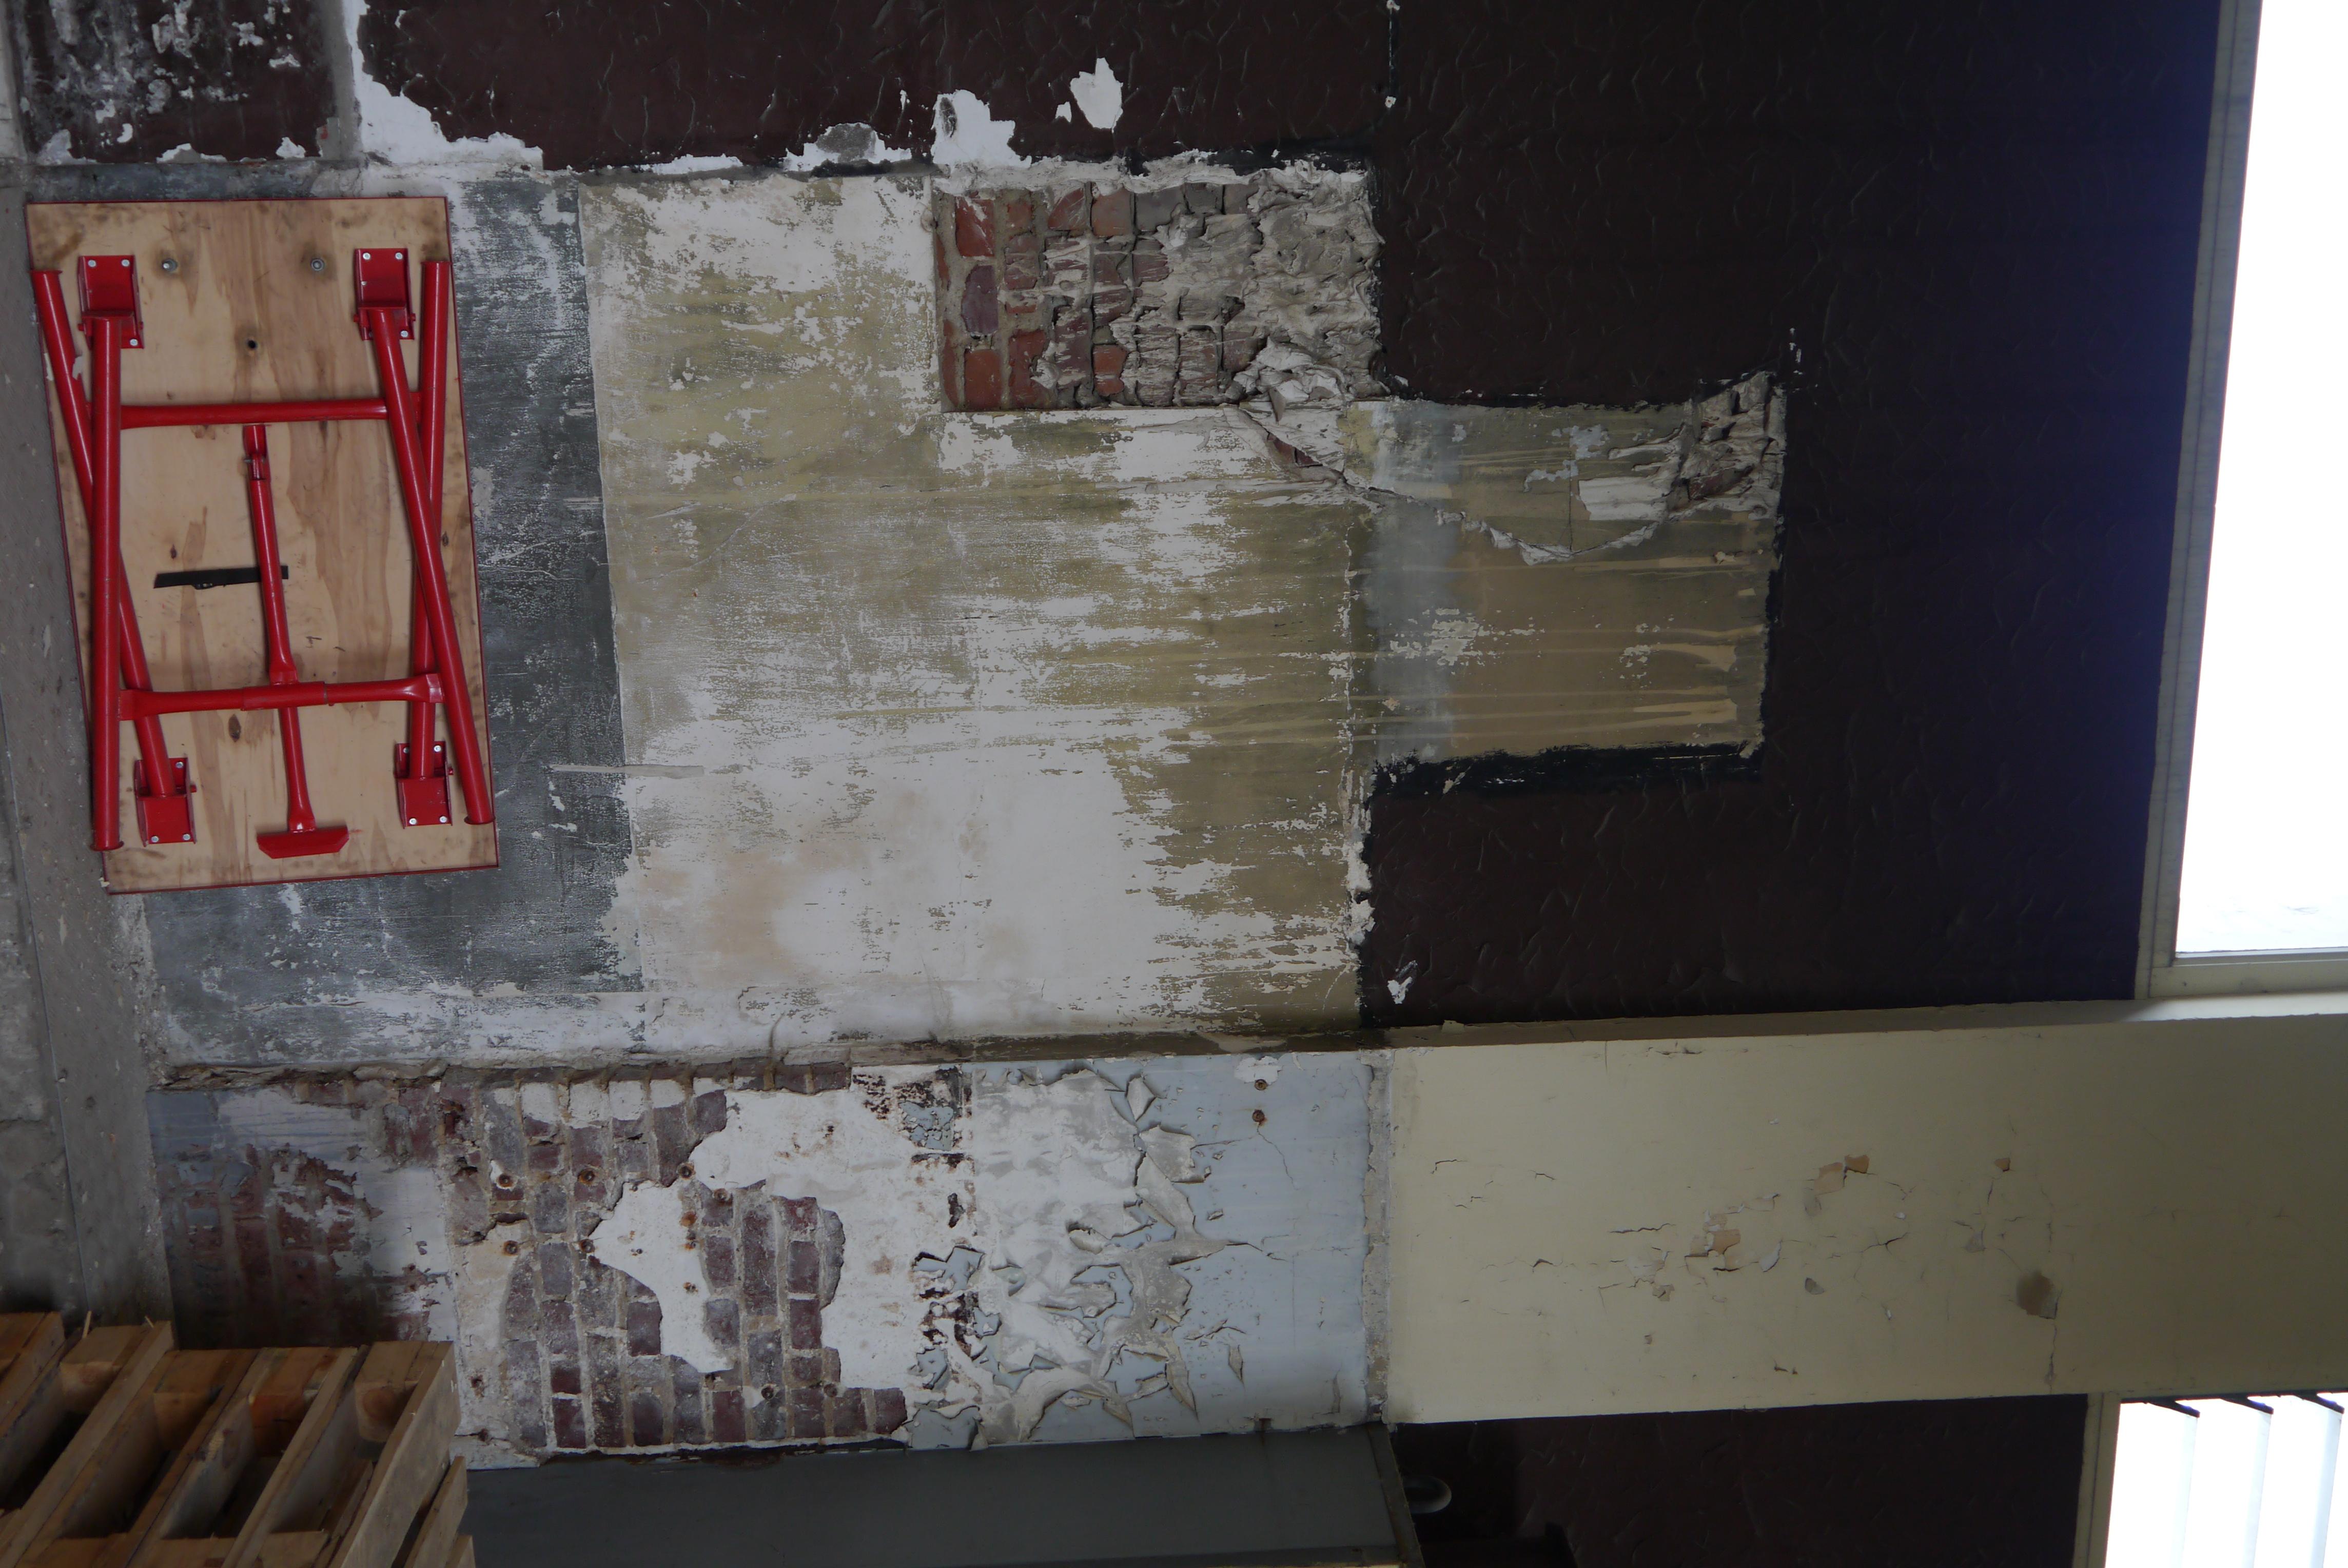 Murs dégradés